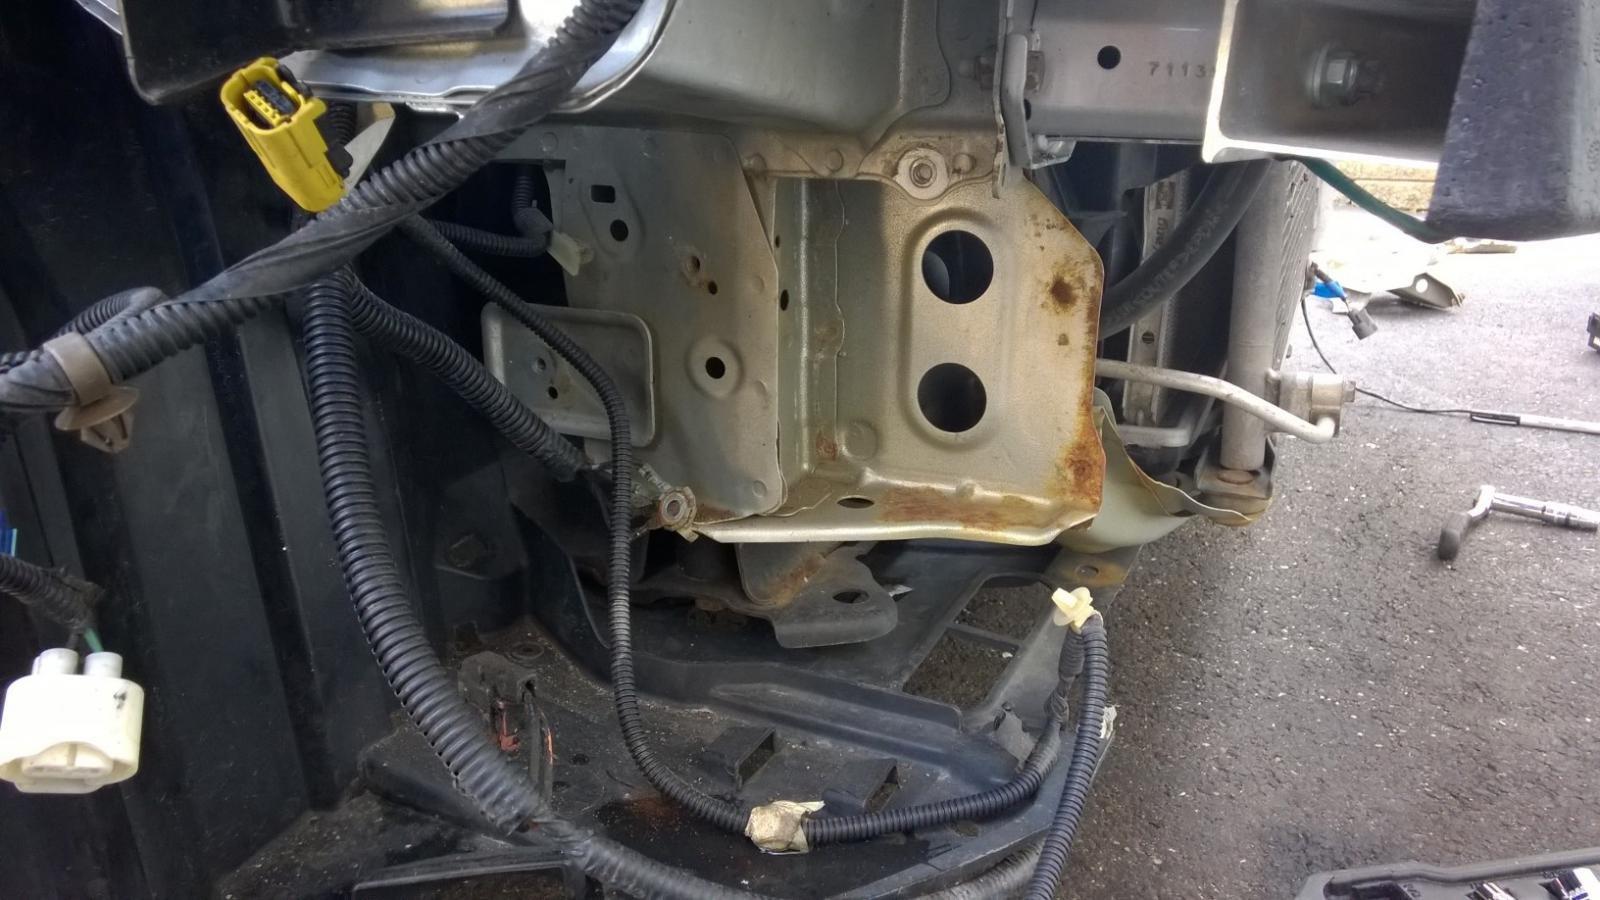 Diy R18 Engine Wire Tuck 8th Generation Honda Civic Forum 2012 Wiring Harness Wp 20150406 10 46 14 Pro